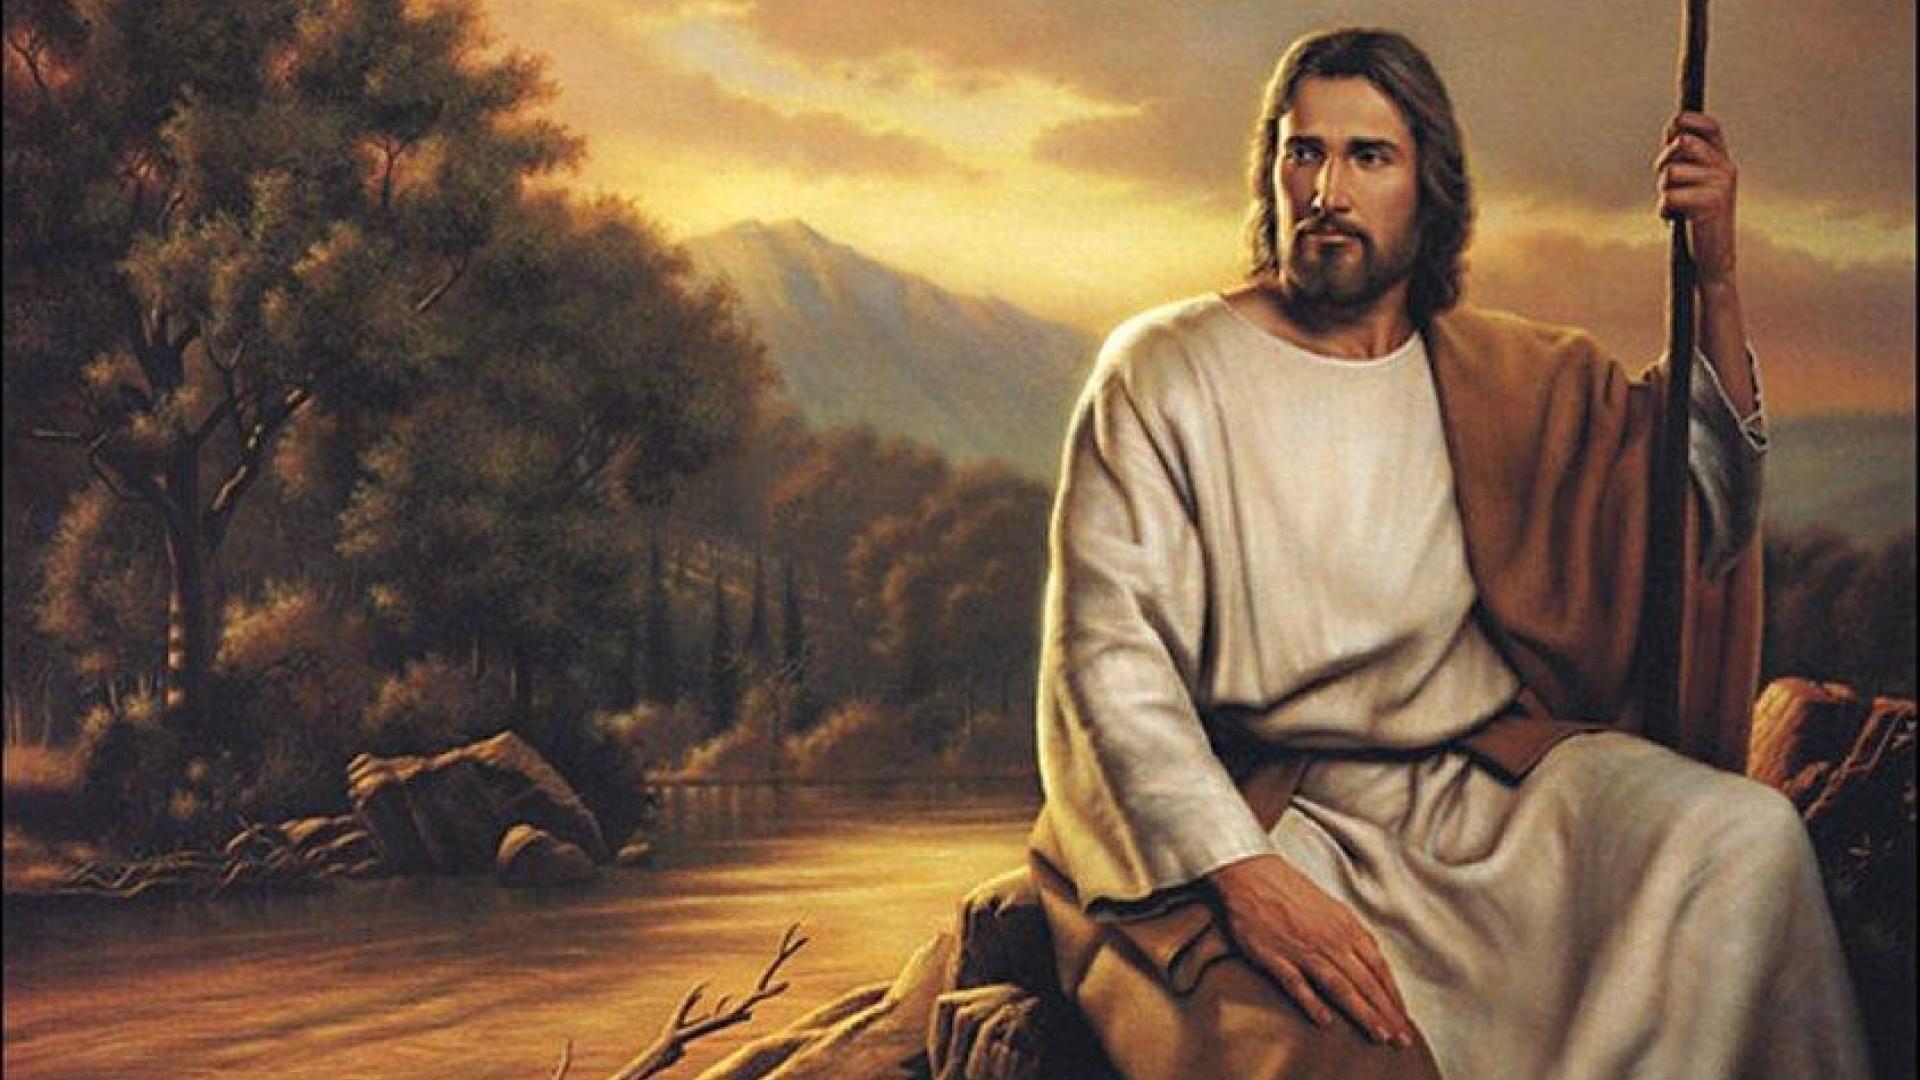 Jesucristo Jesus wallpaper Jesus pictures Images of christ 1920x1080